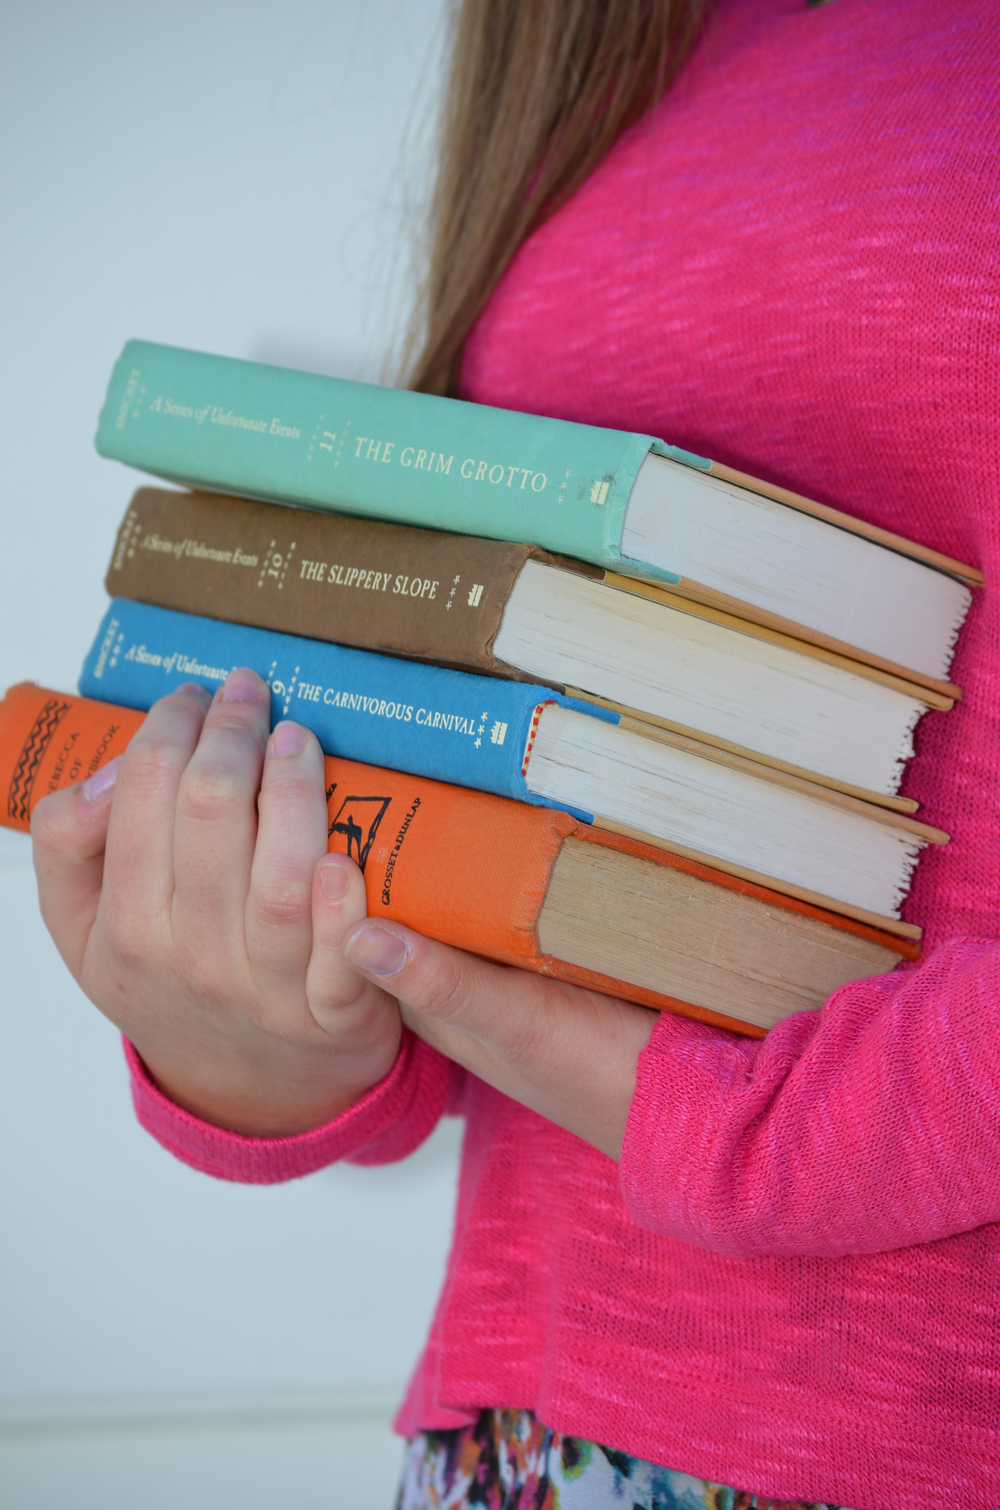 TimbreBooks.jpg